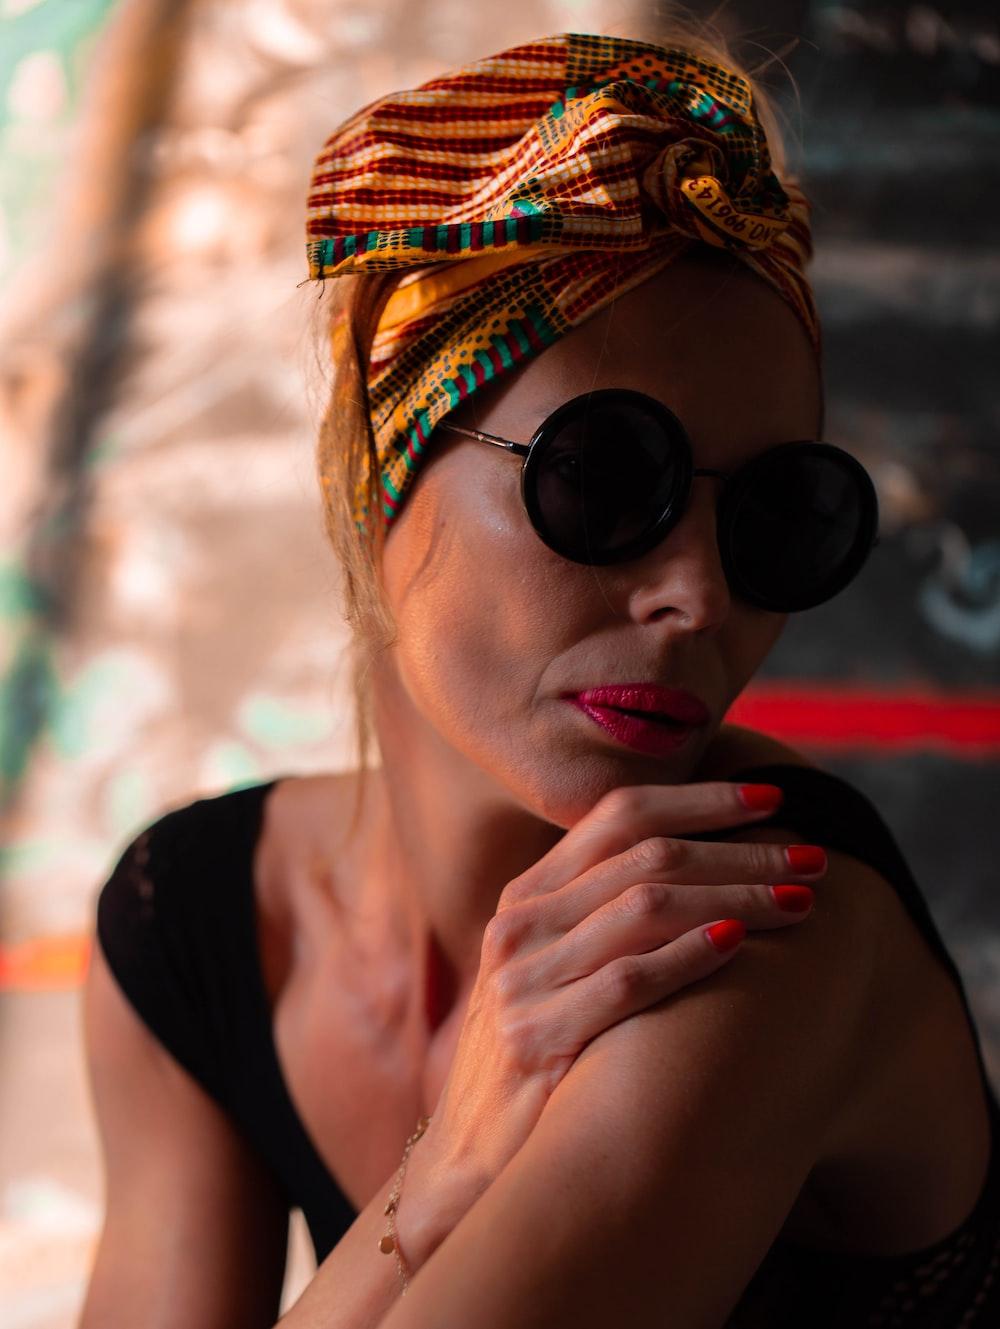 woman in black tank top wearing black sunglasses